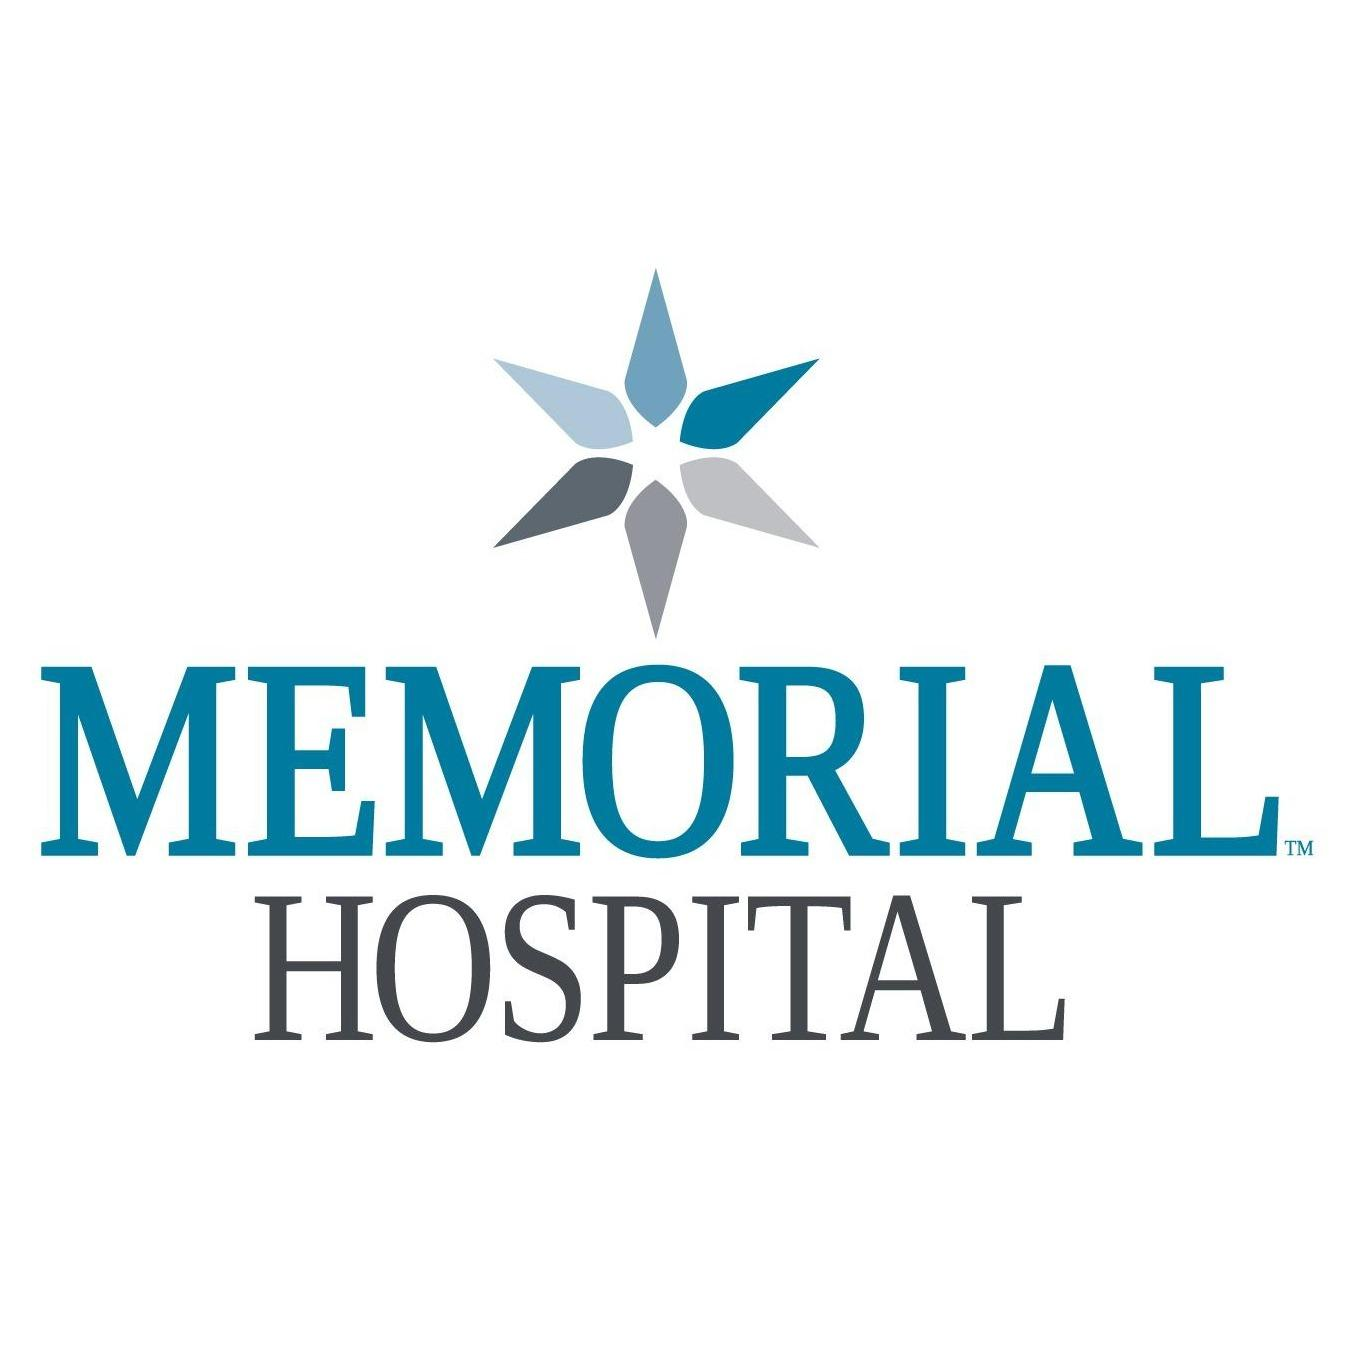 Memorial Hospital - Beacon Health System